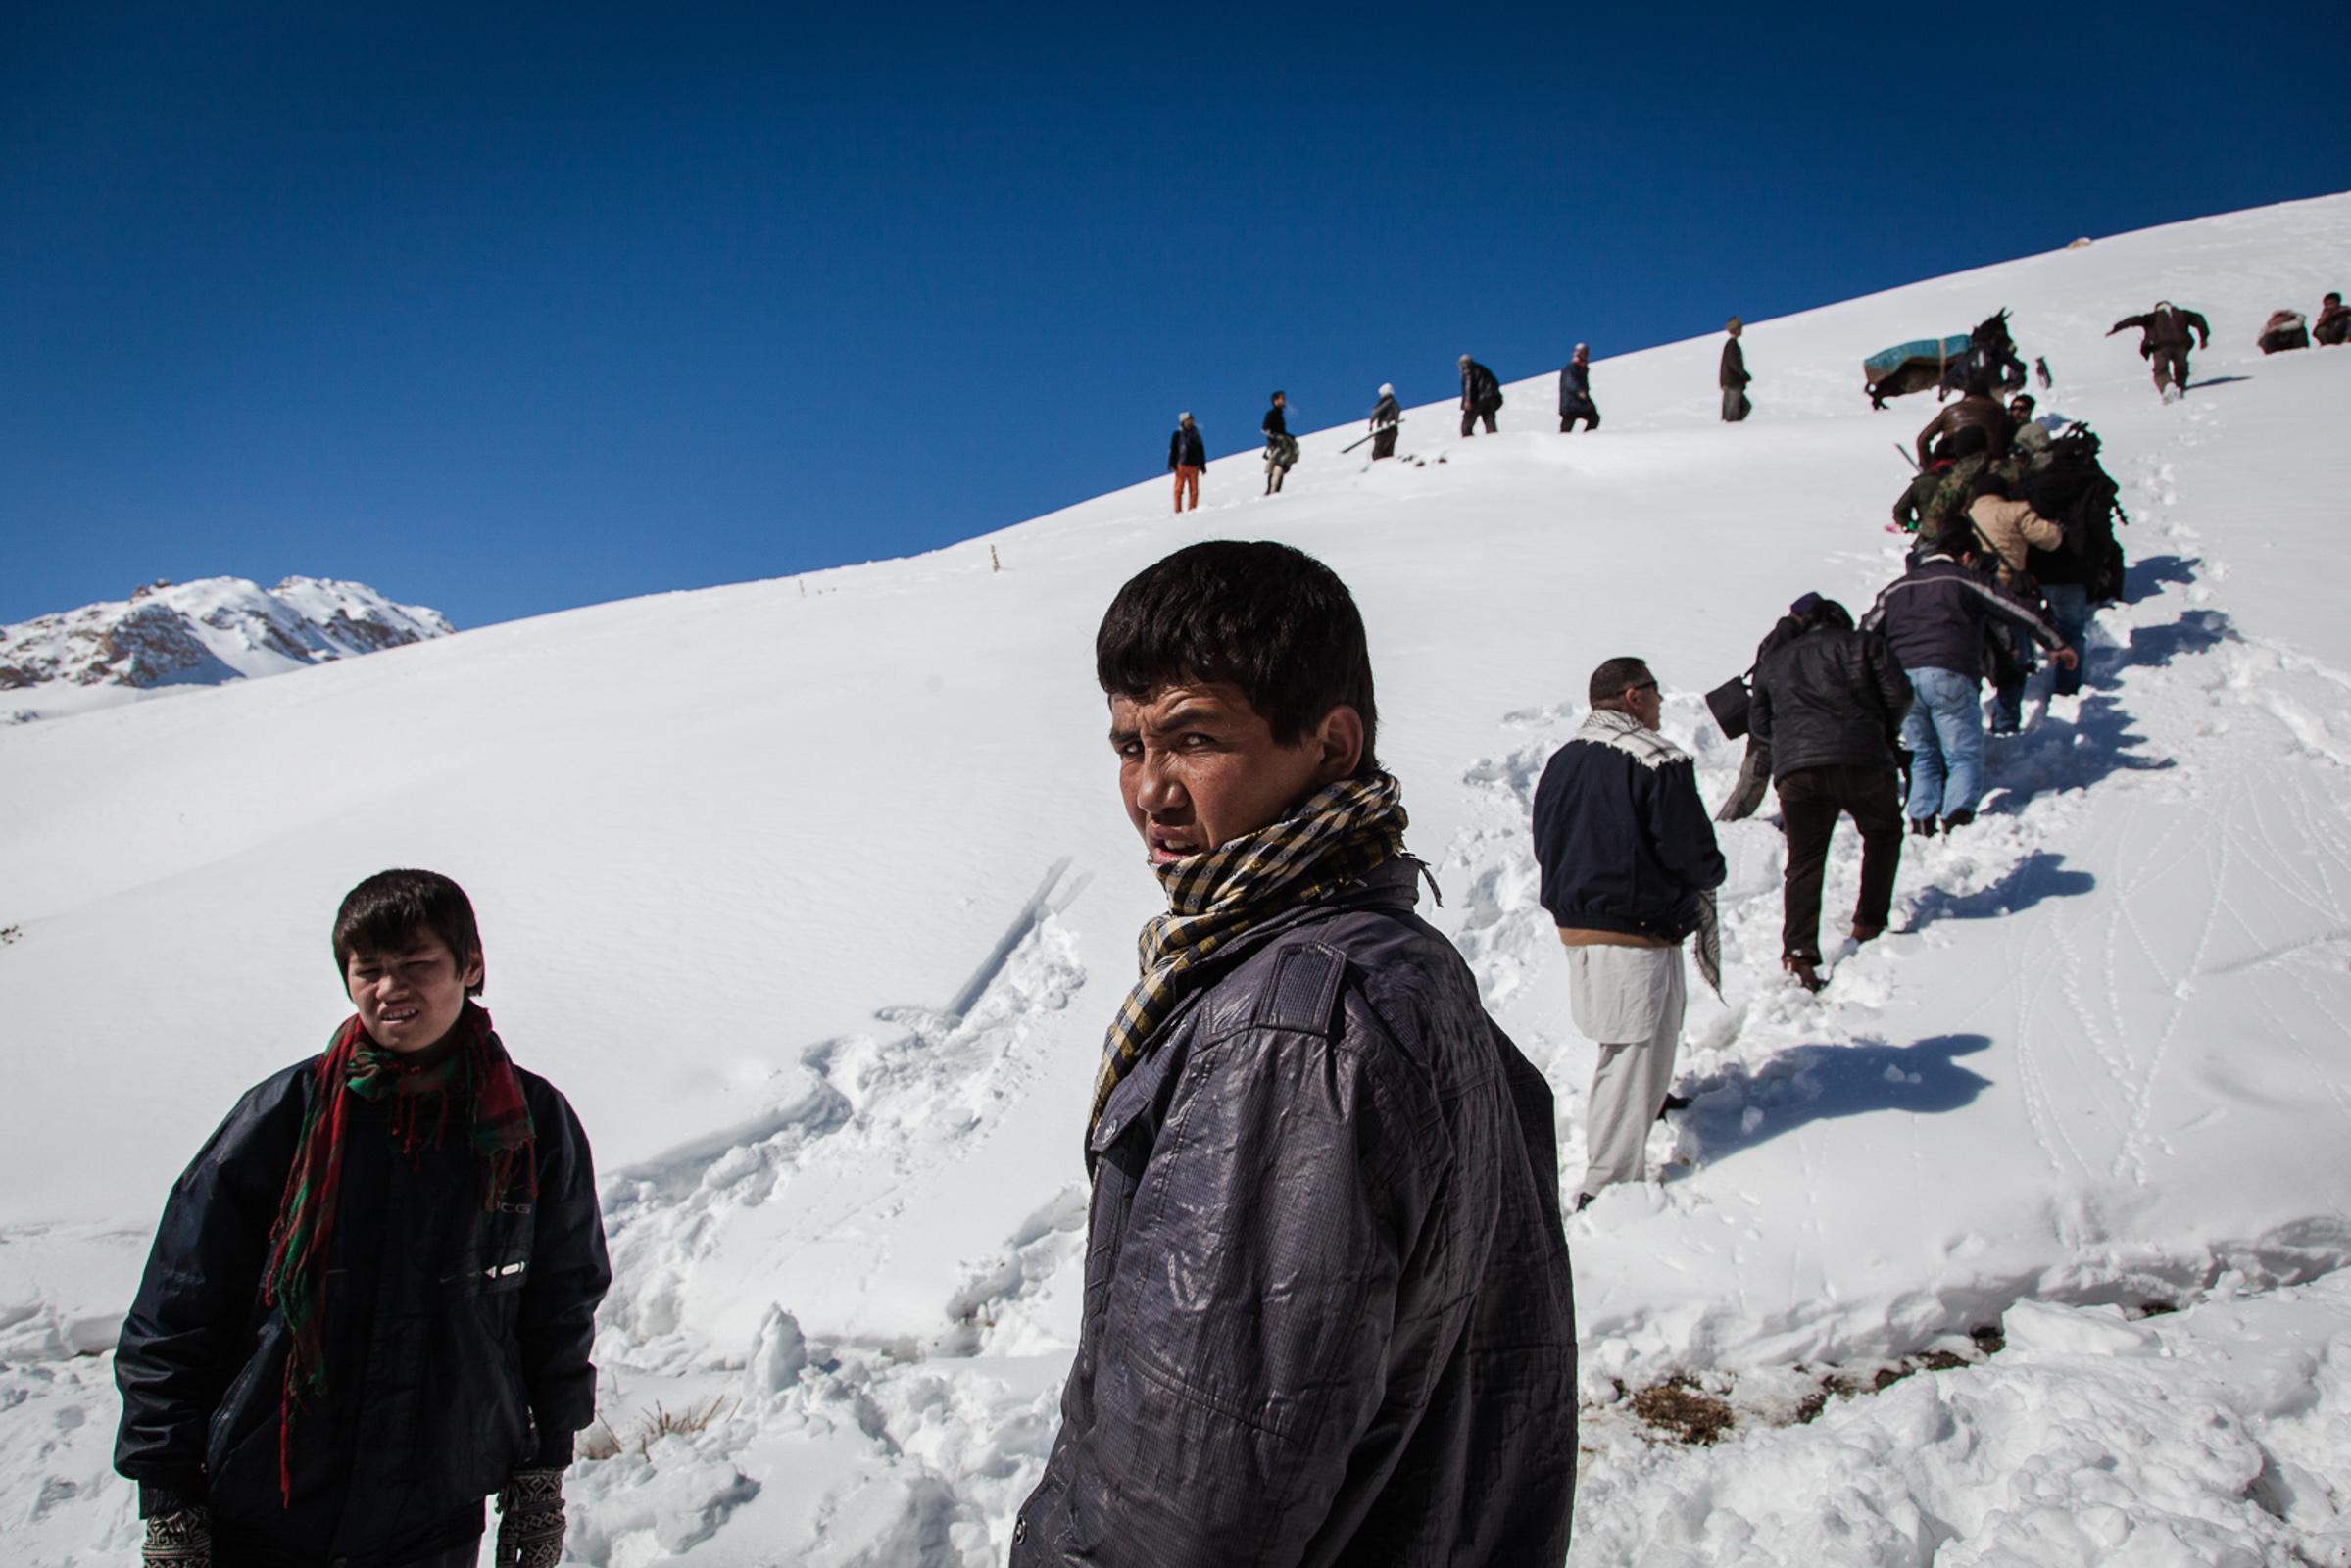 koh-e-baba, 1er Mars 2013. de jeunes afghans montent  vers le départ de l'afghan ski challenge.  Koh-e-Baba, March 1, 2013. Young Afghans wlking to the start of the Afghan ski challenge.